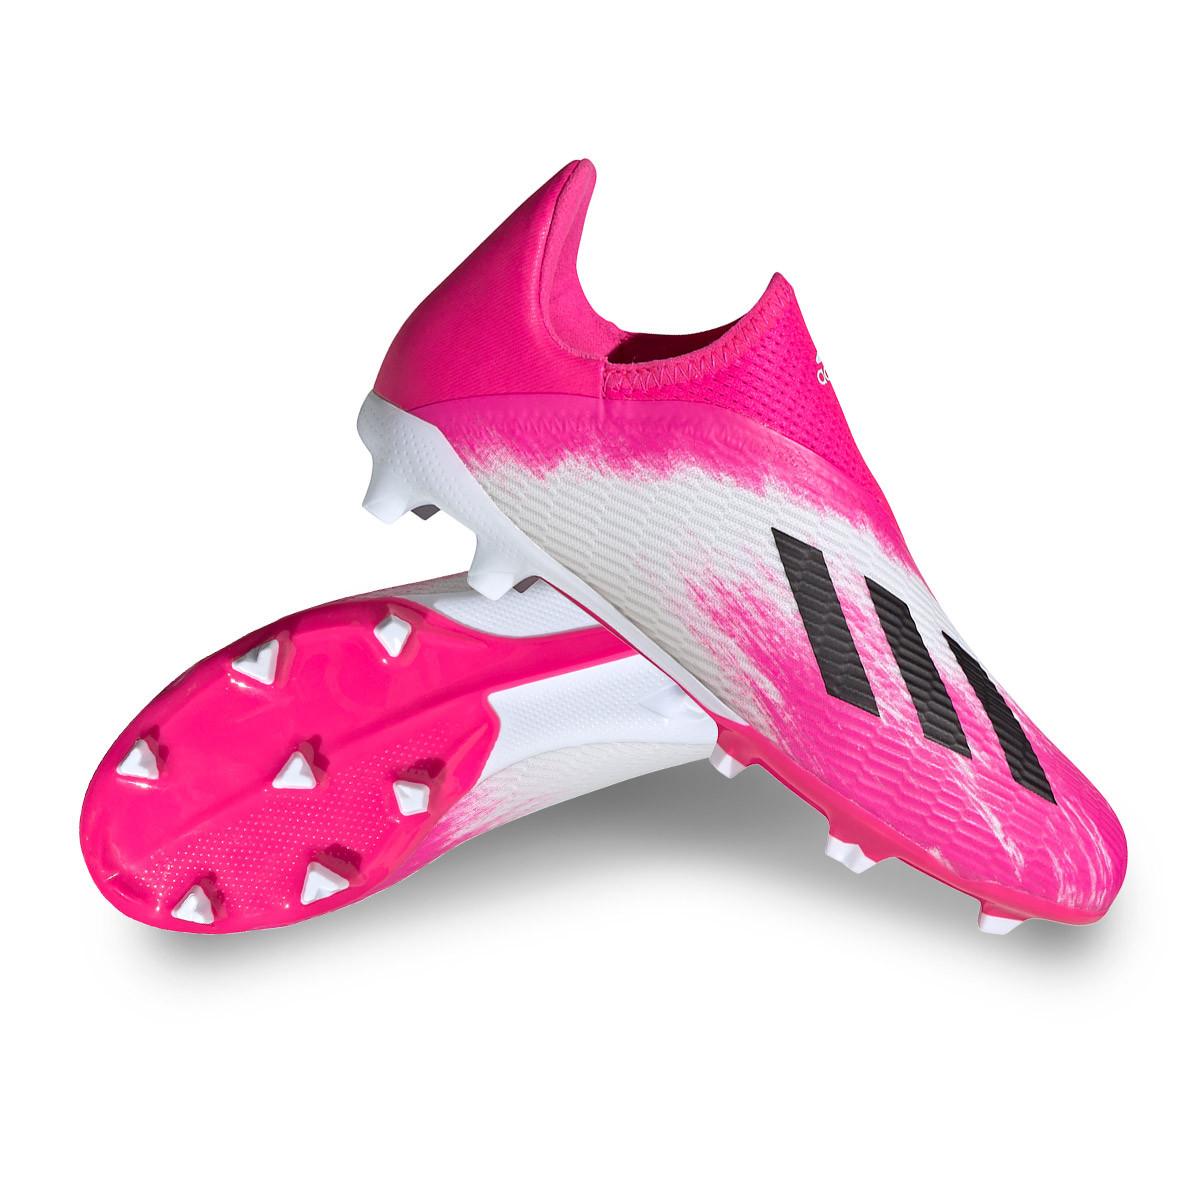 embargo Inconsciente al exilio  Football Boots adidas X 19.3 LL FG Kids White-Black-Shock pink - Football  store Fútbol Emotion